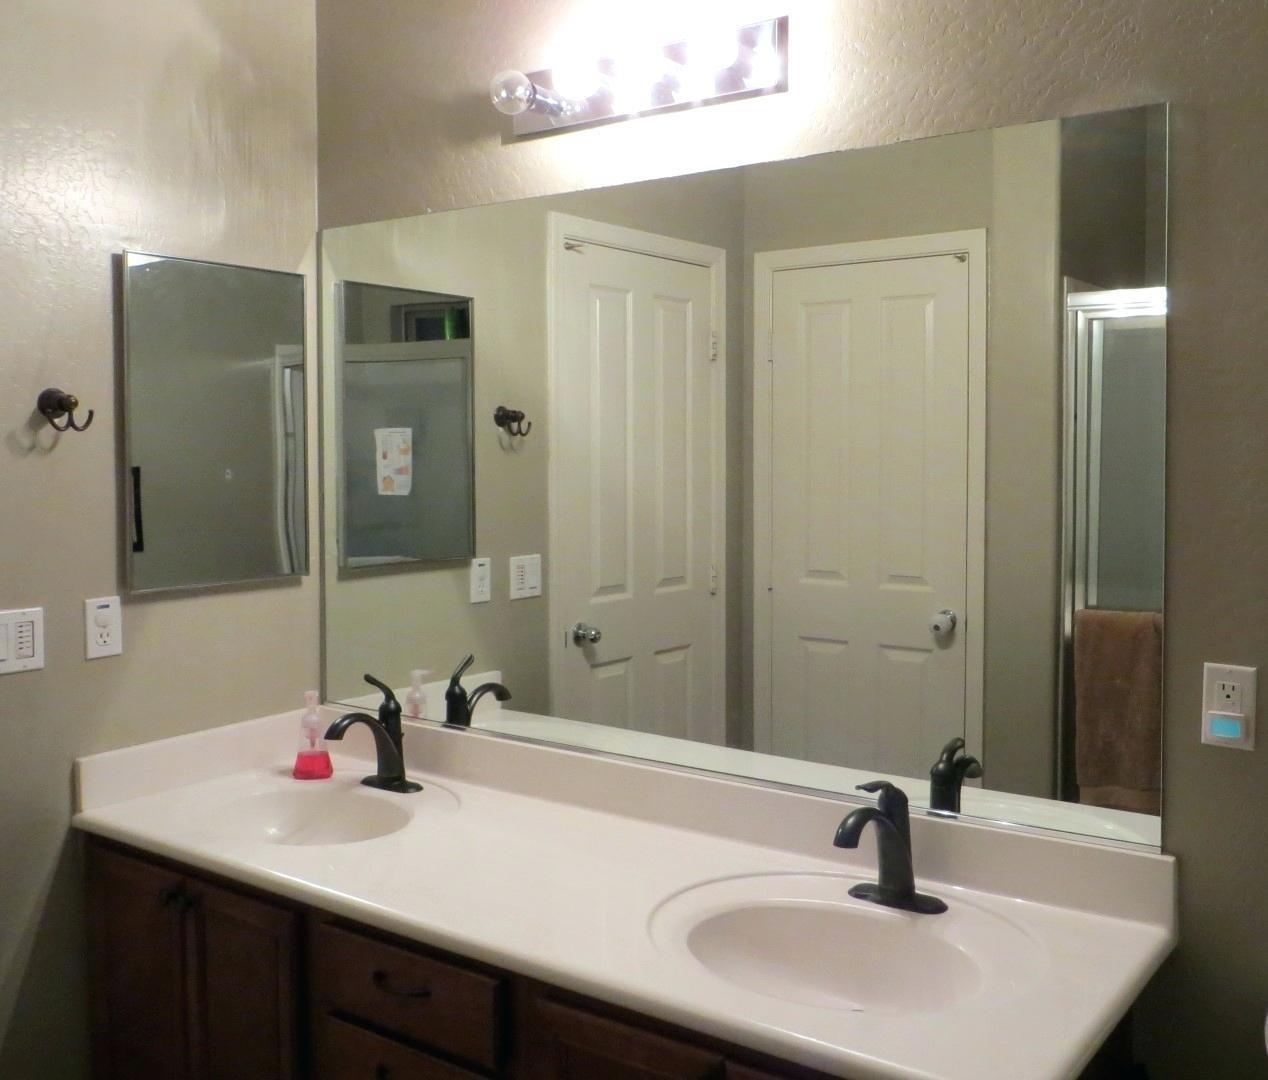 Wall Mirrors For Bathroom – Hondaherreros In Wall Mirrors For Bathrooms (View 16 of 20)